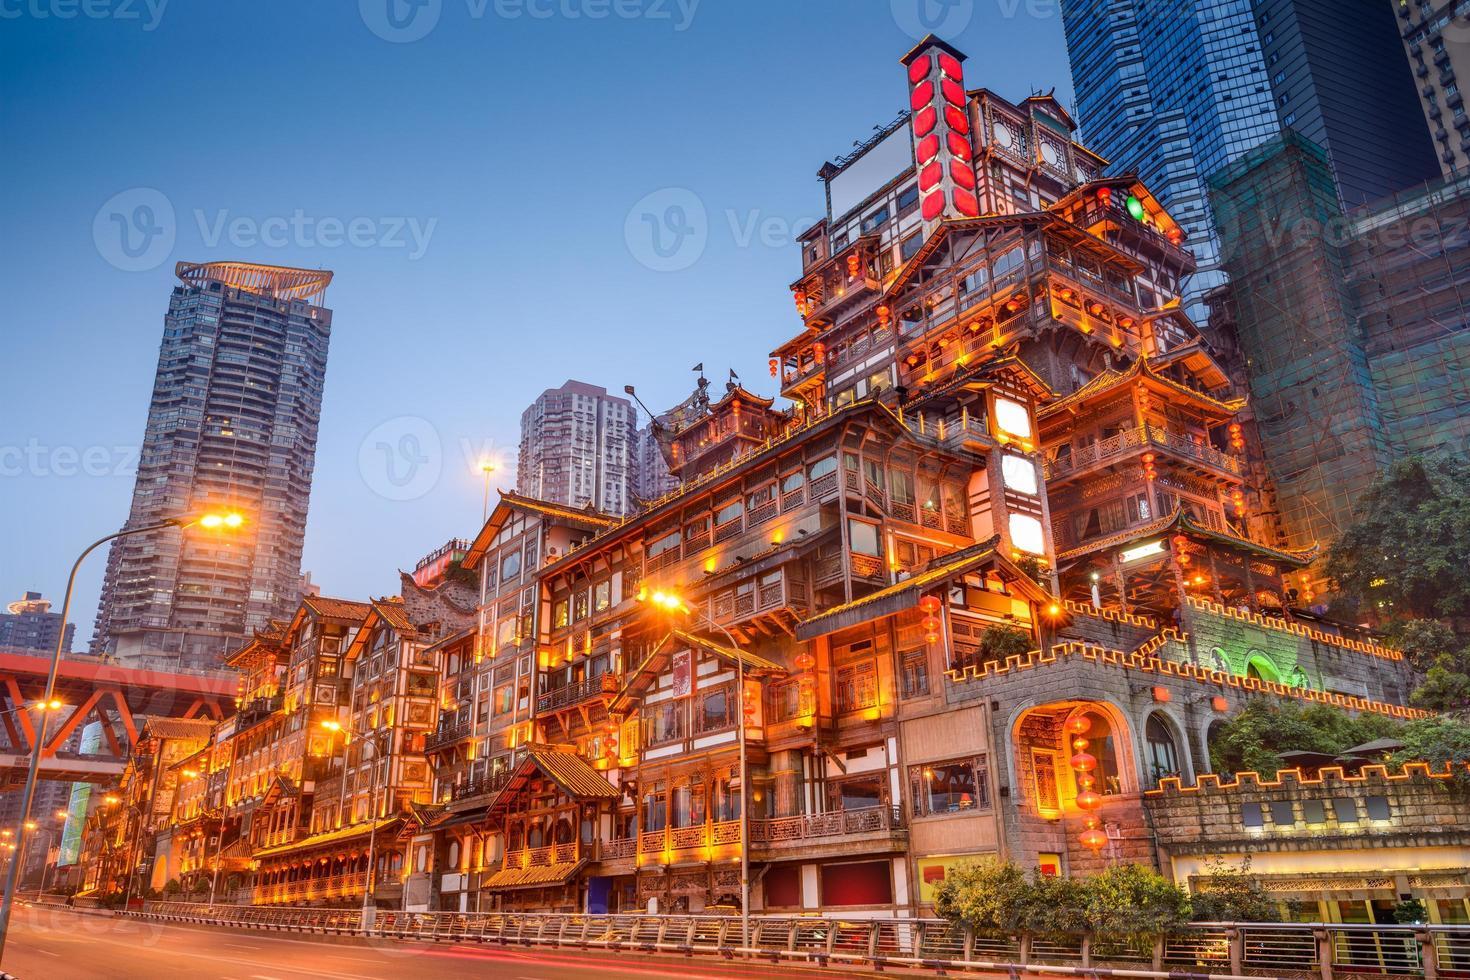 Chongqing China photo